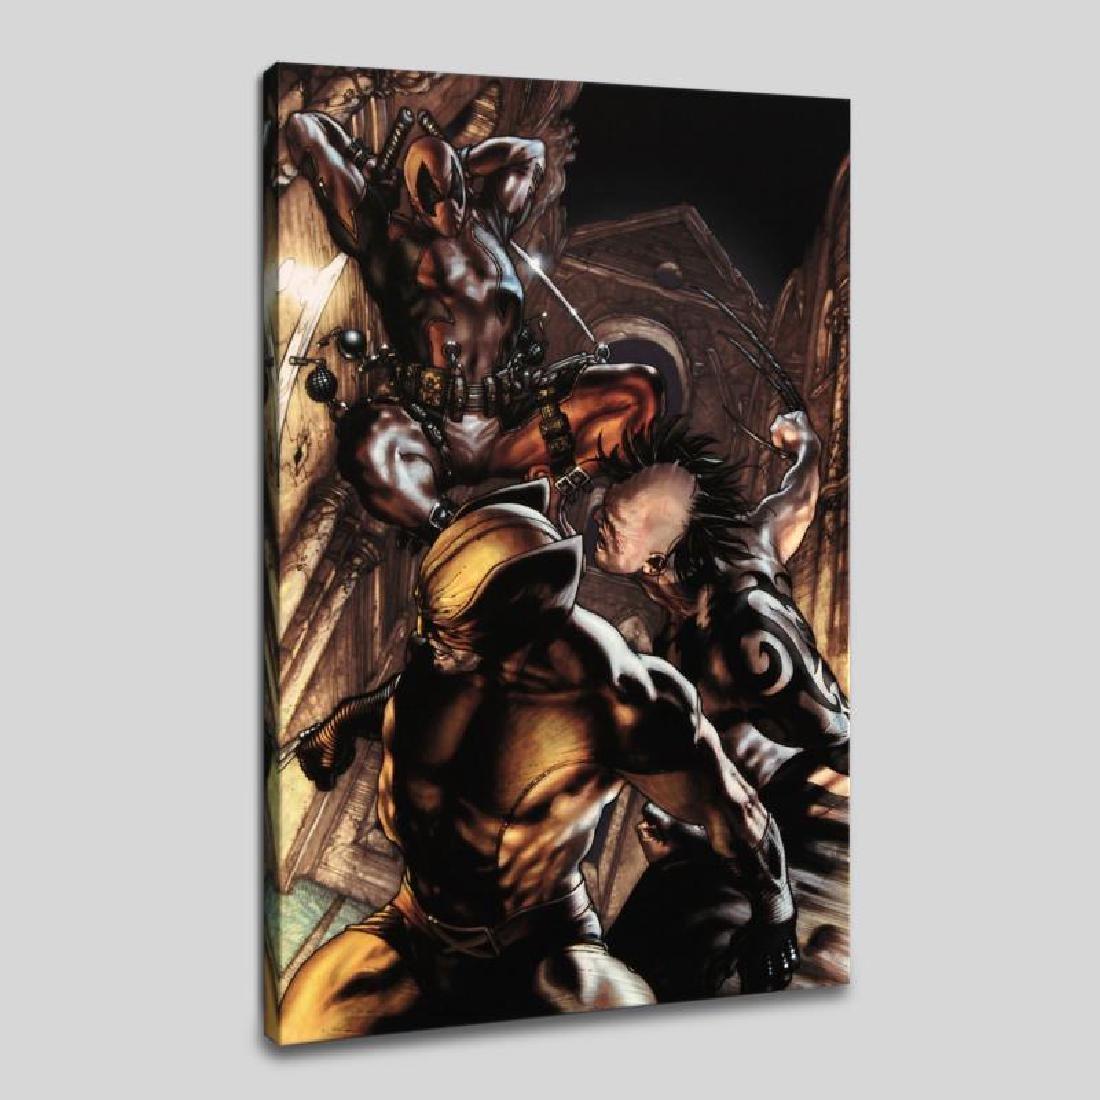 Wolverine: Origins #25 by Marvel Comics - 3